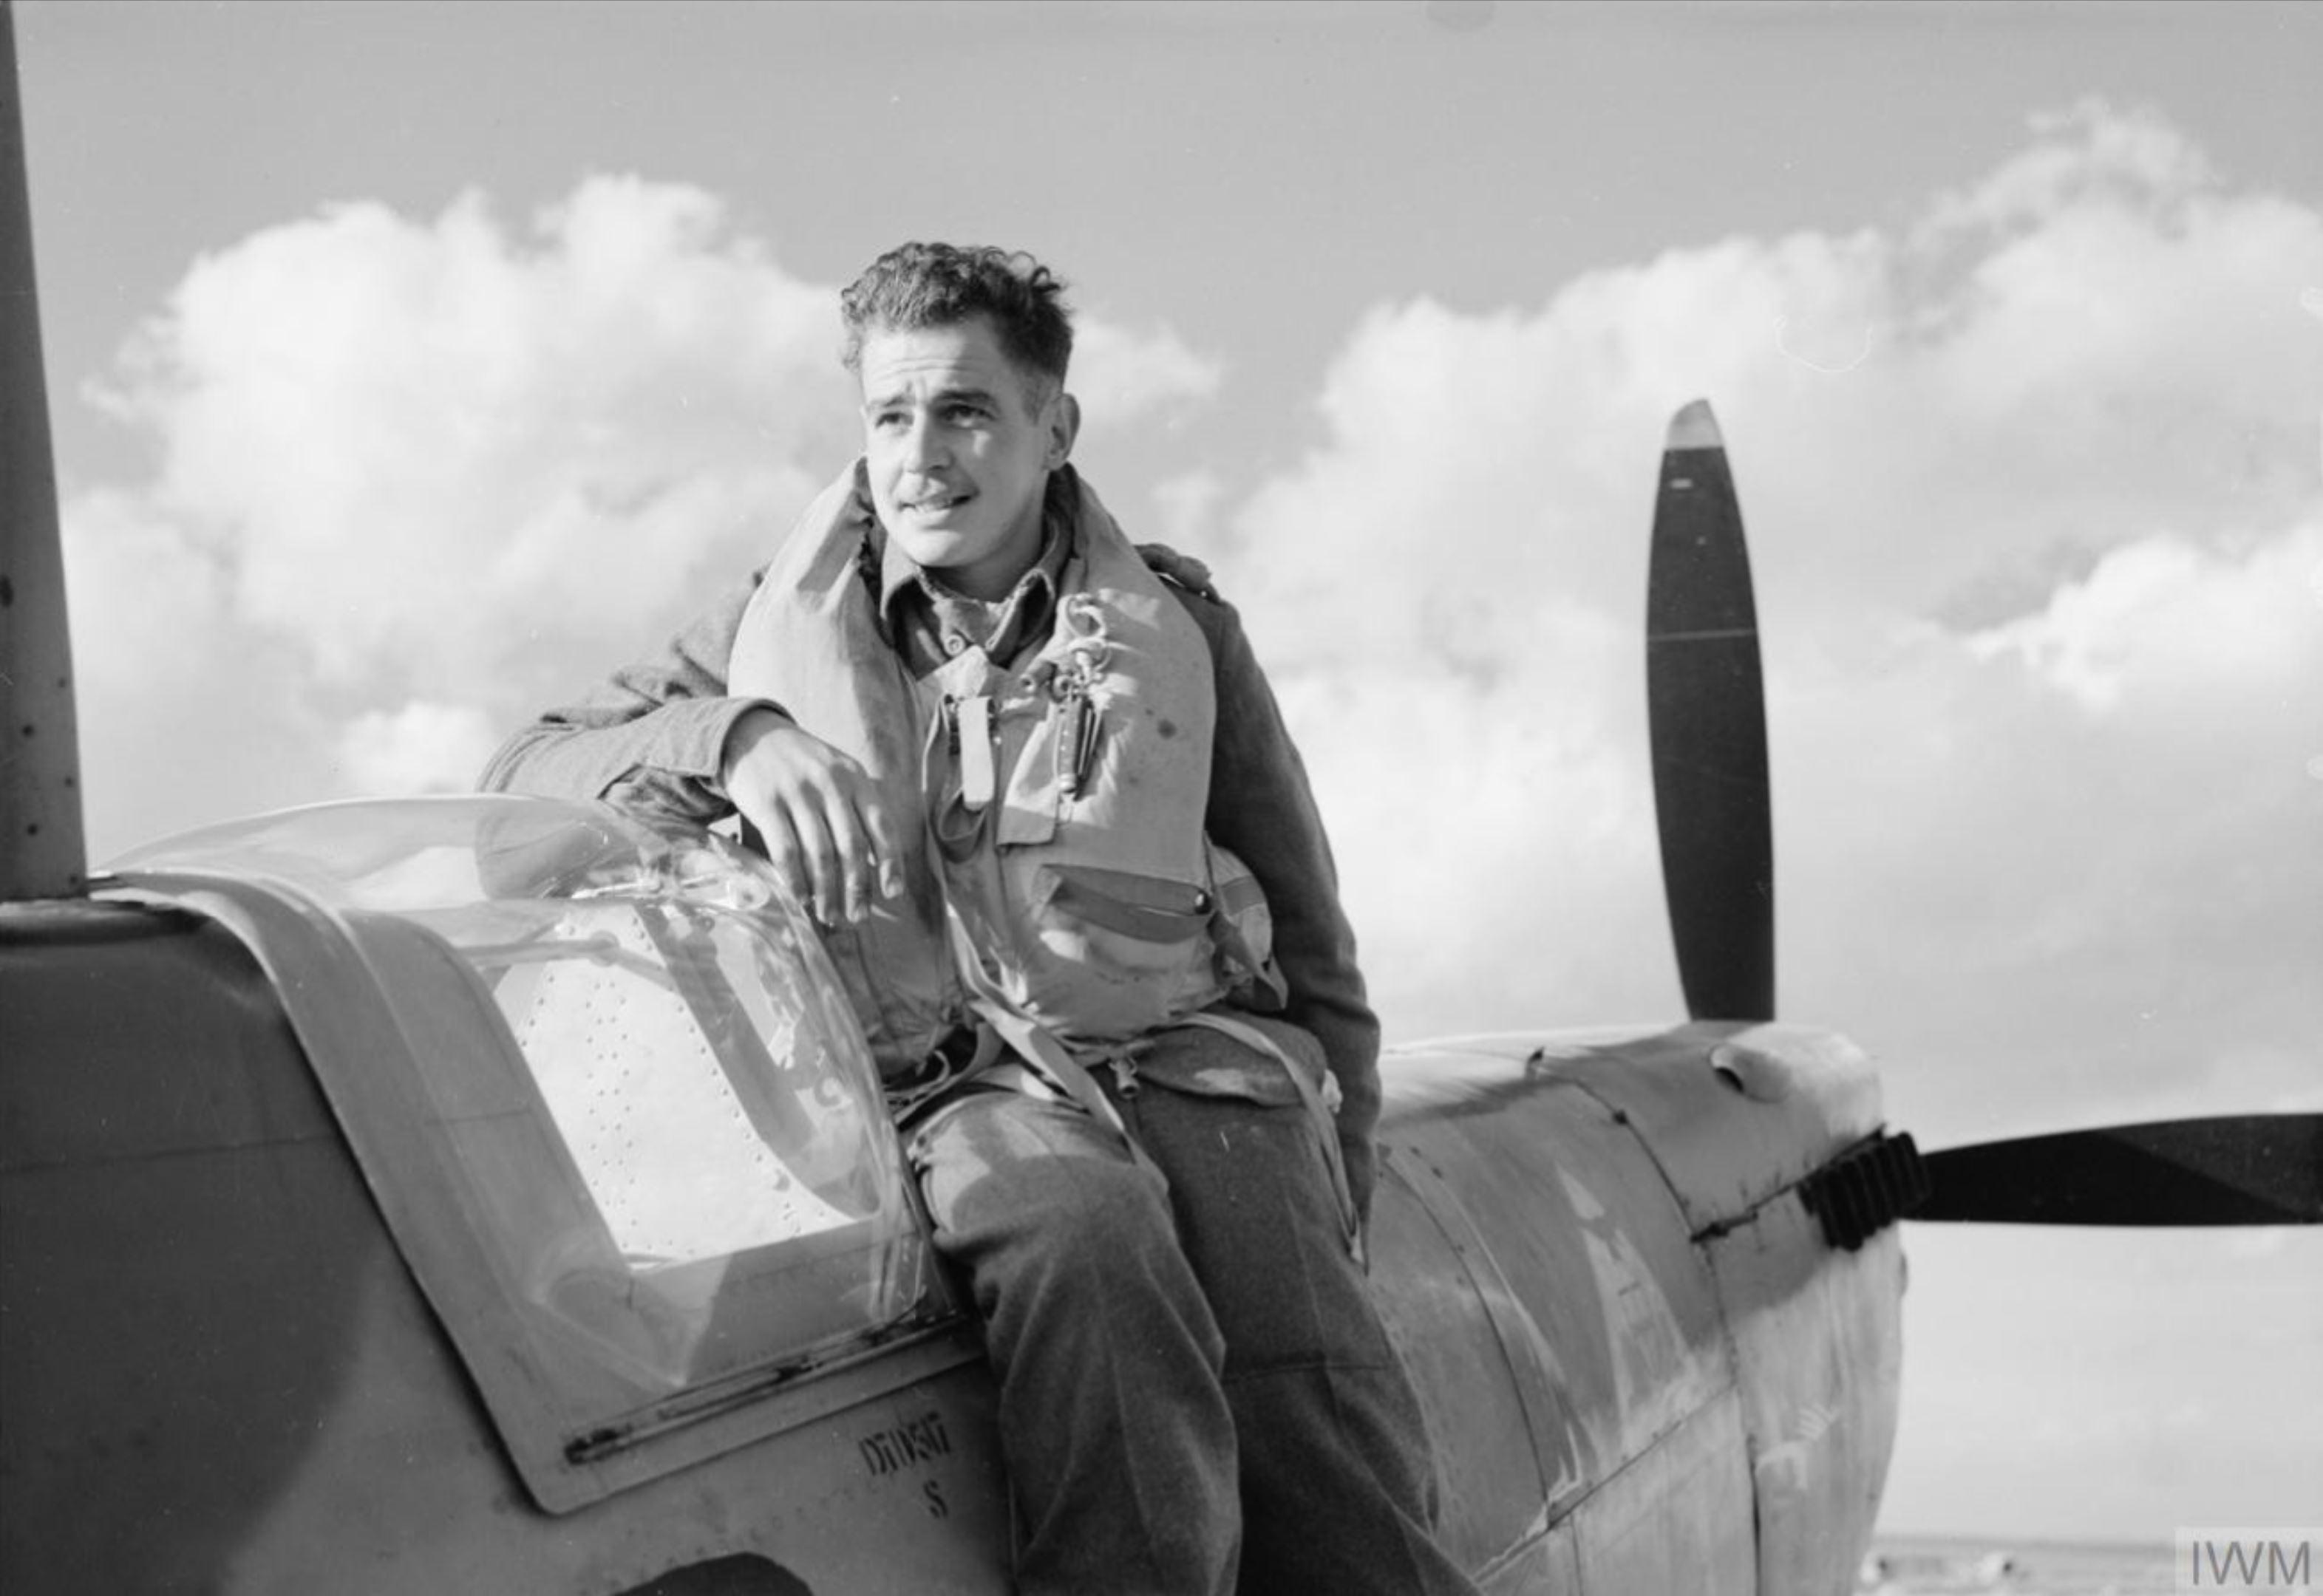 Aircrew RAF 92Sqn SAAF Lt A Sachs at Canne Italy Dec 1943 IWM CNA2315